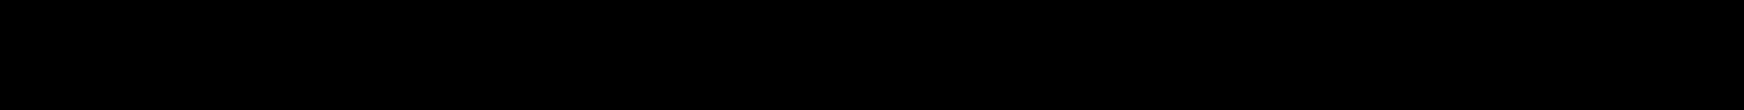 NeutraText-DemiItalic.otf